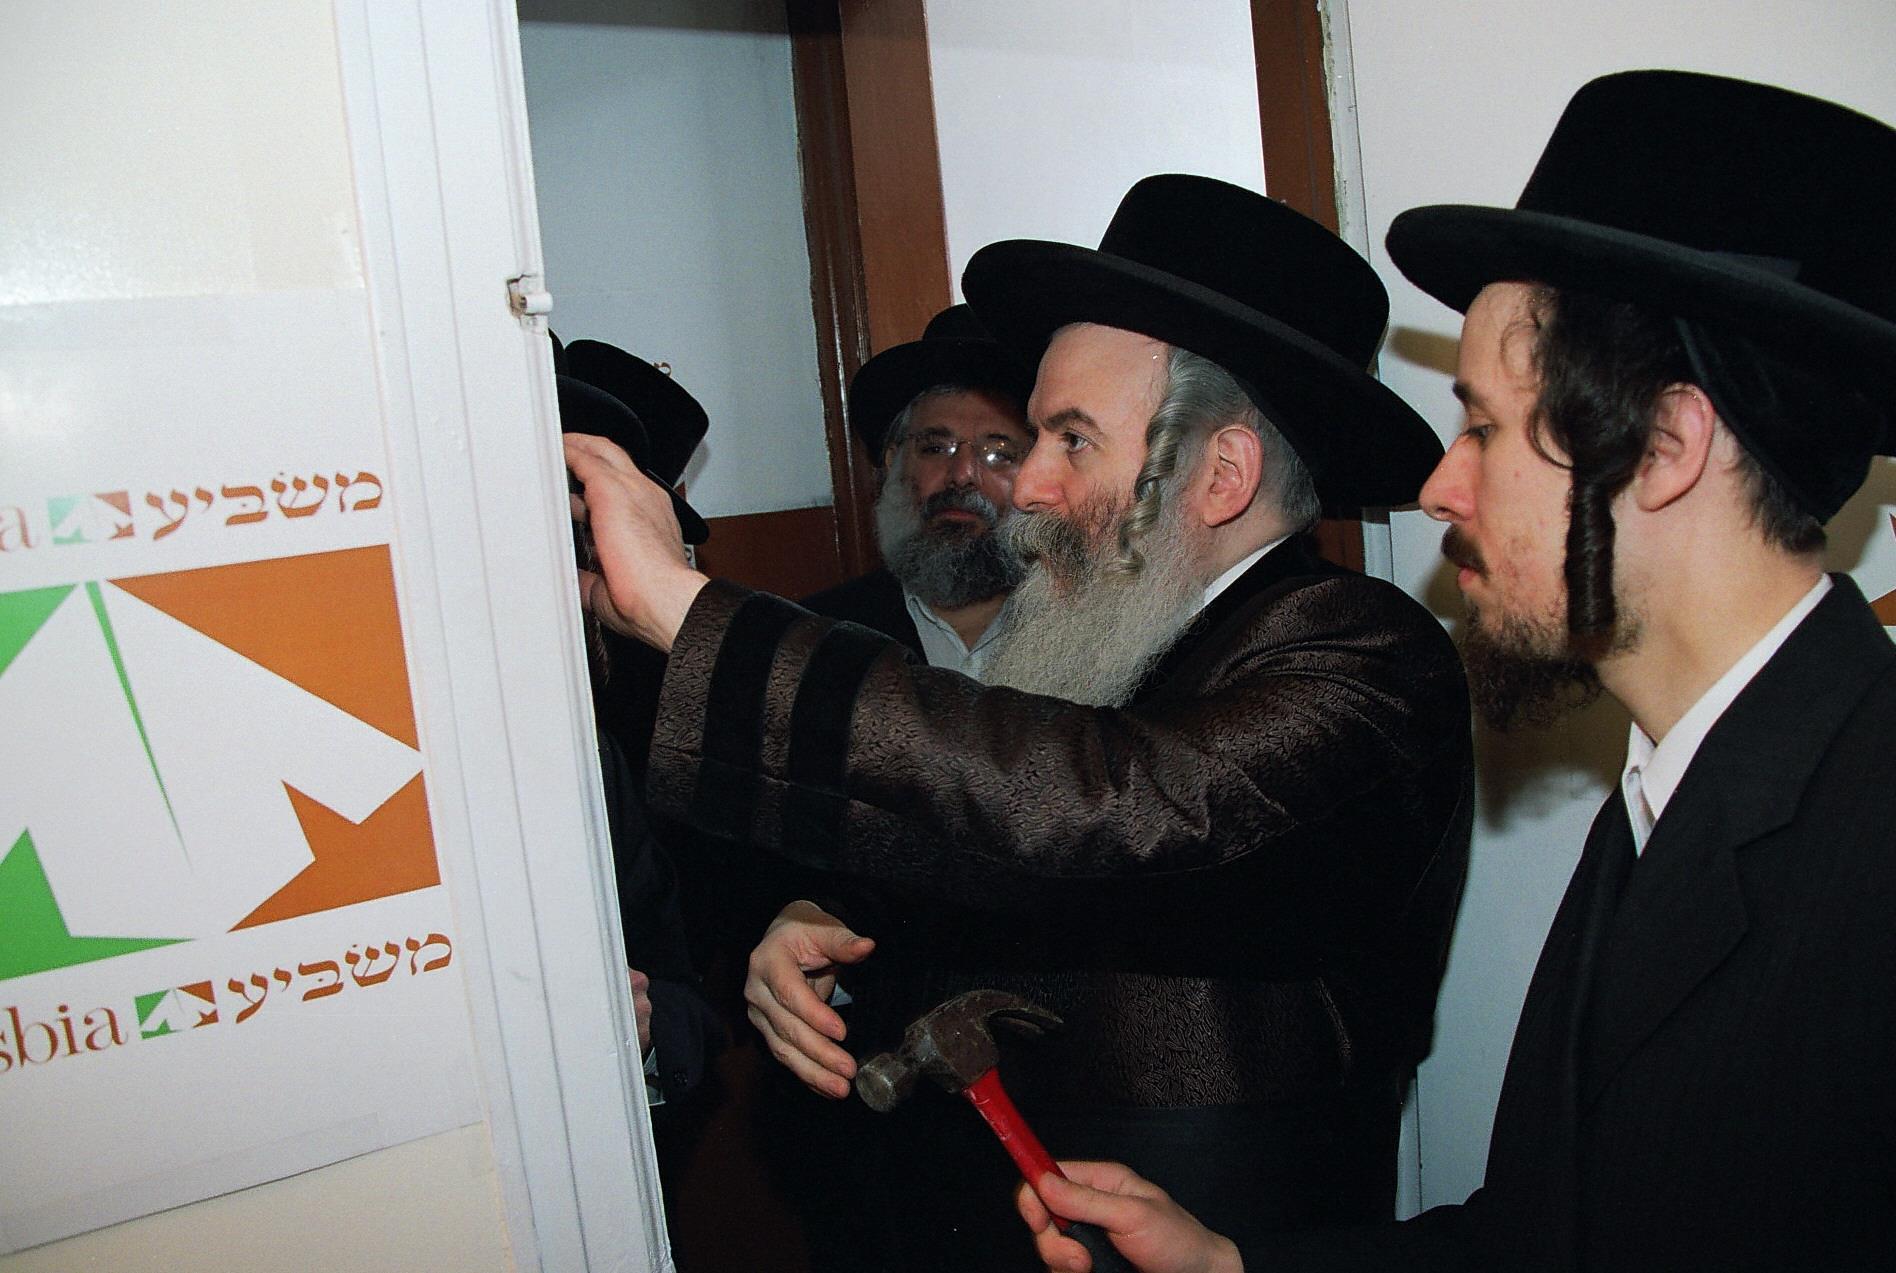 Masbia_Supporter__Bobover_Rebbe__Rabbi_Ben_Zion_Halberstam__Affixing_a_Mezuzah_at_Masbia_of_Boro_Park1.jpg